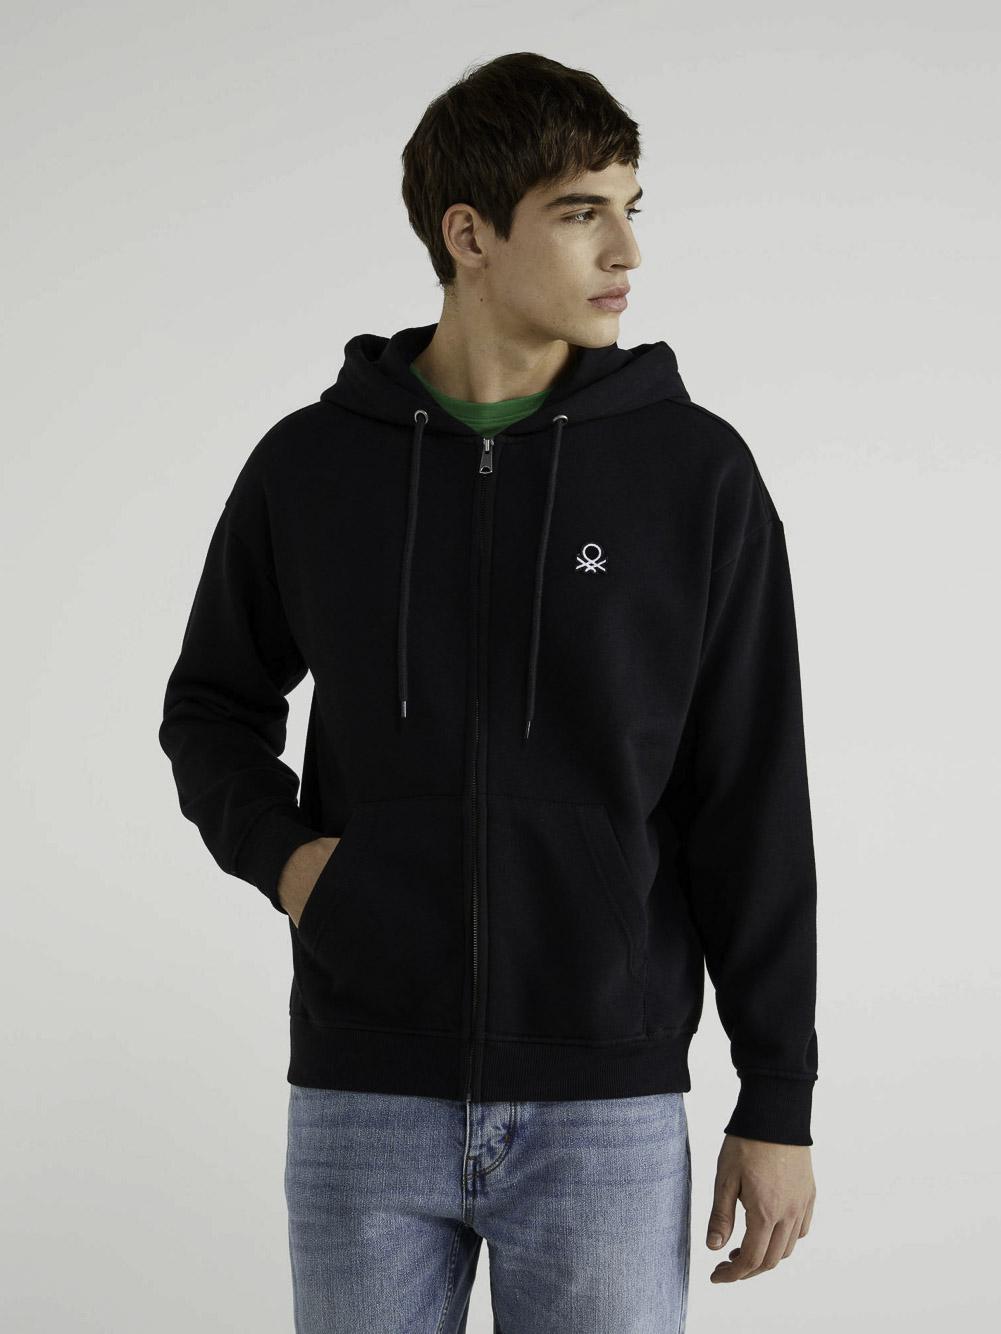 BENETTON Φούτερ με τσέπες και κουκούλα 3J73J5217 20A100